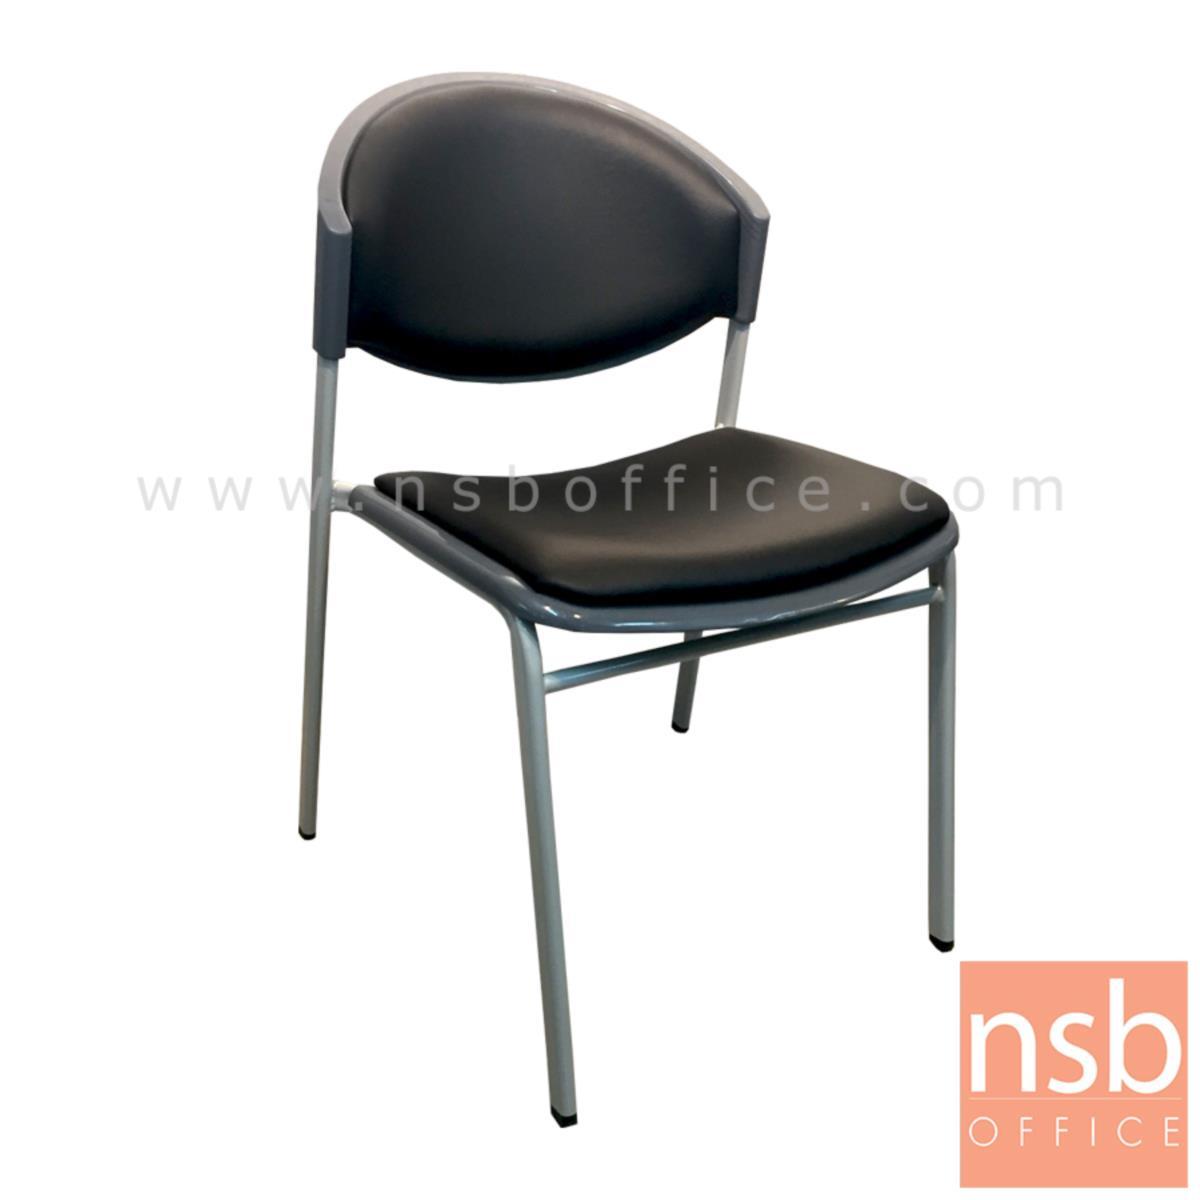 B05A030:เก้าอี้อเนกประสงค์เฟรมโพลี่ รุ่น A3-970  ขาเหล็ก